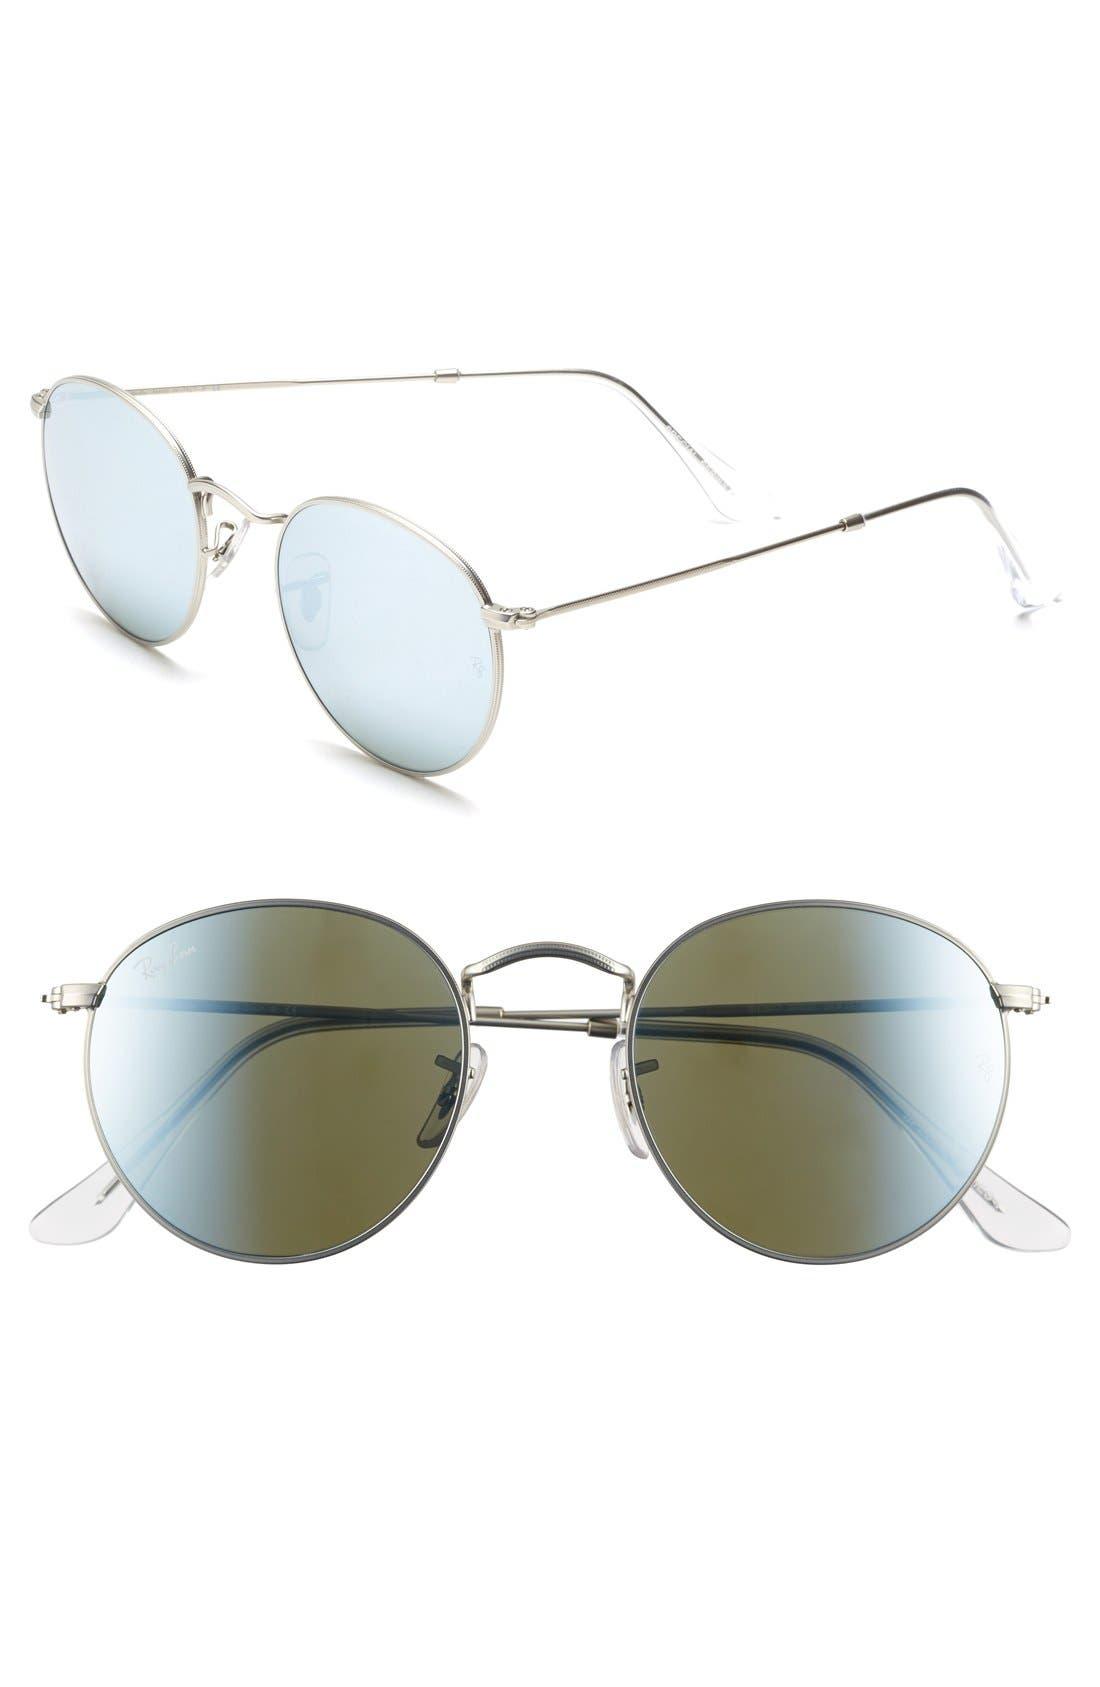 Ray-Ban Icons 50Mm Sunglasses -